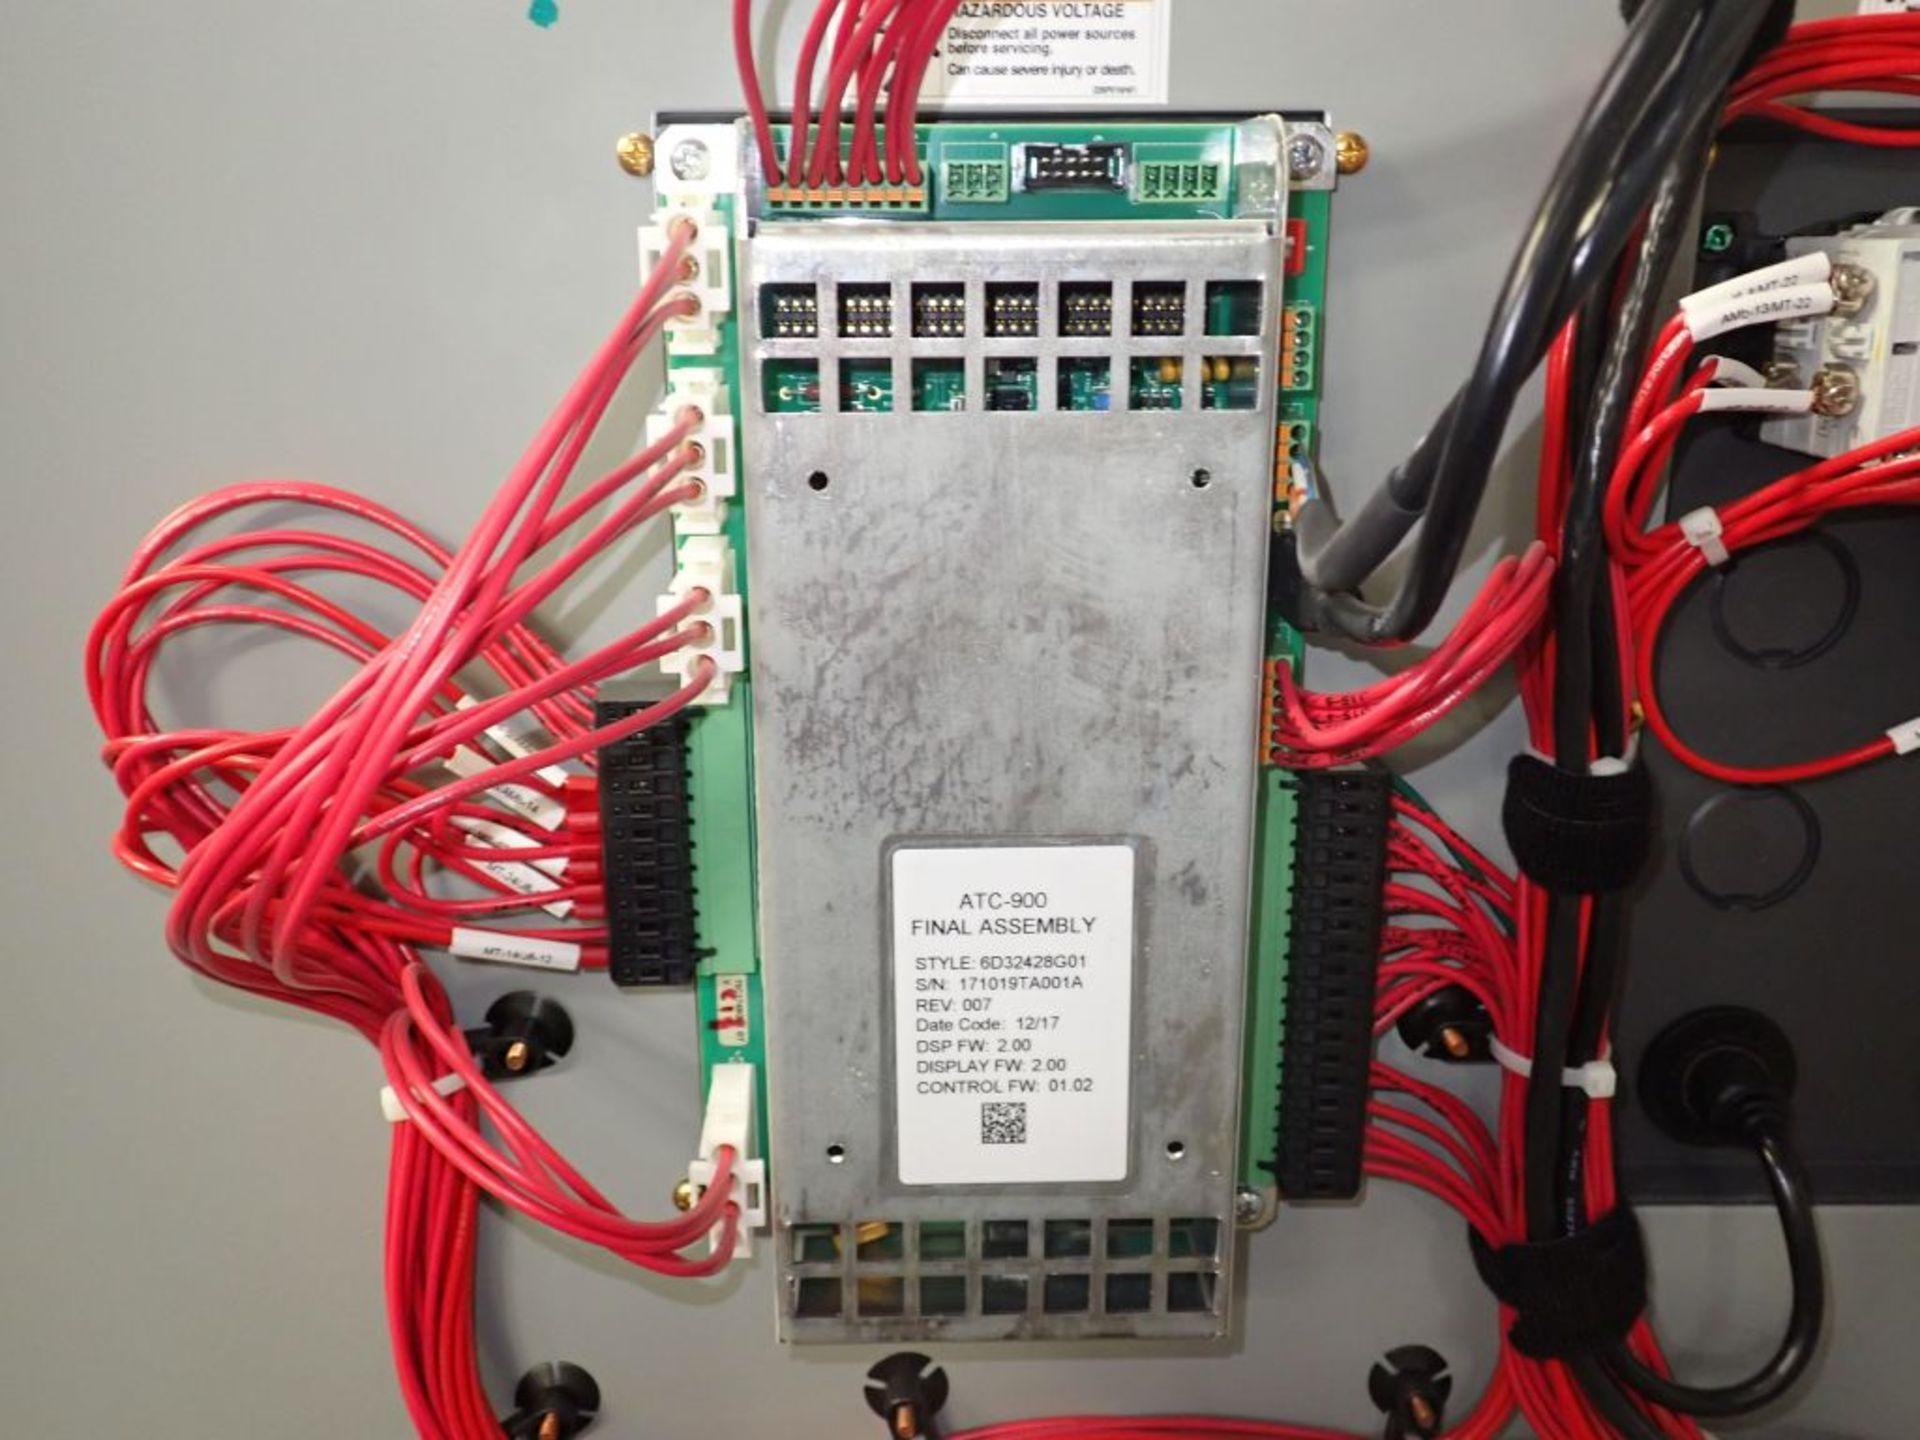 Eaton Transfer Switch | Cat No. ATV9MGB32500XSU; 480V; 3 PH; 2500A; (2) Eaton Magnum DS Circuit - Image 36 of 50